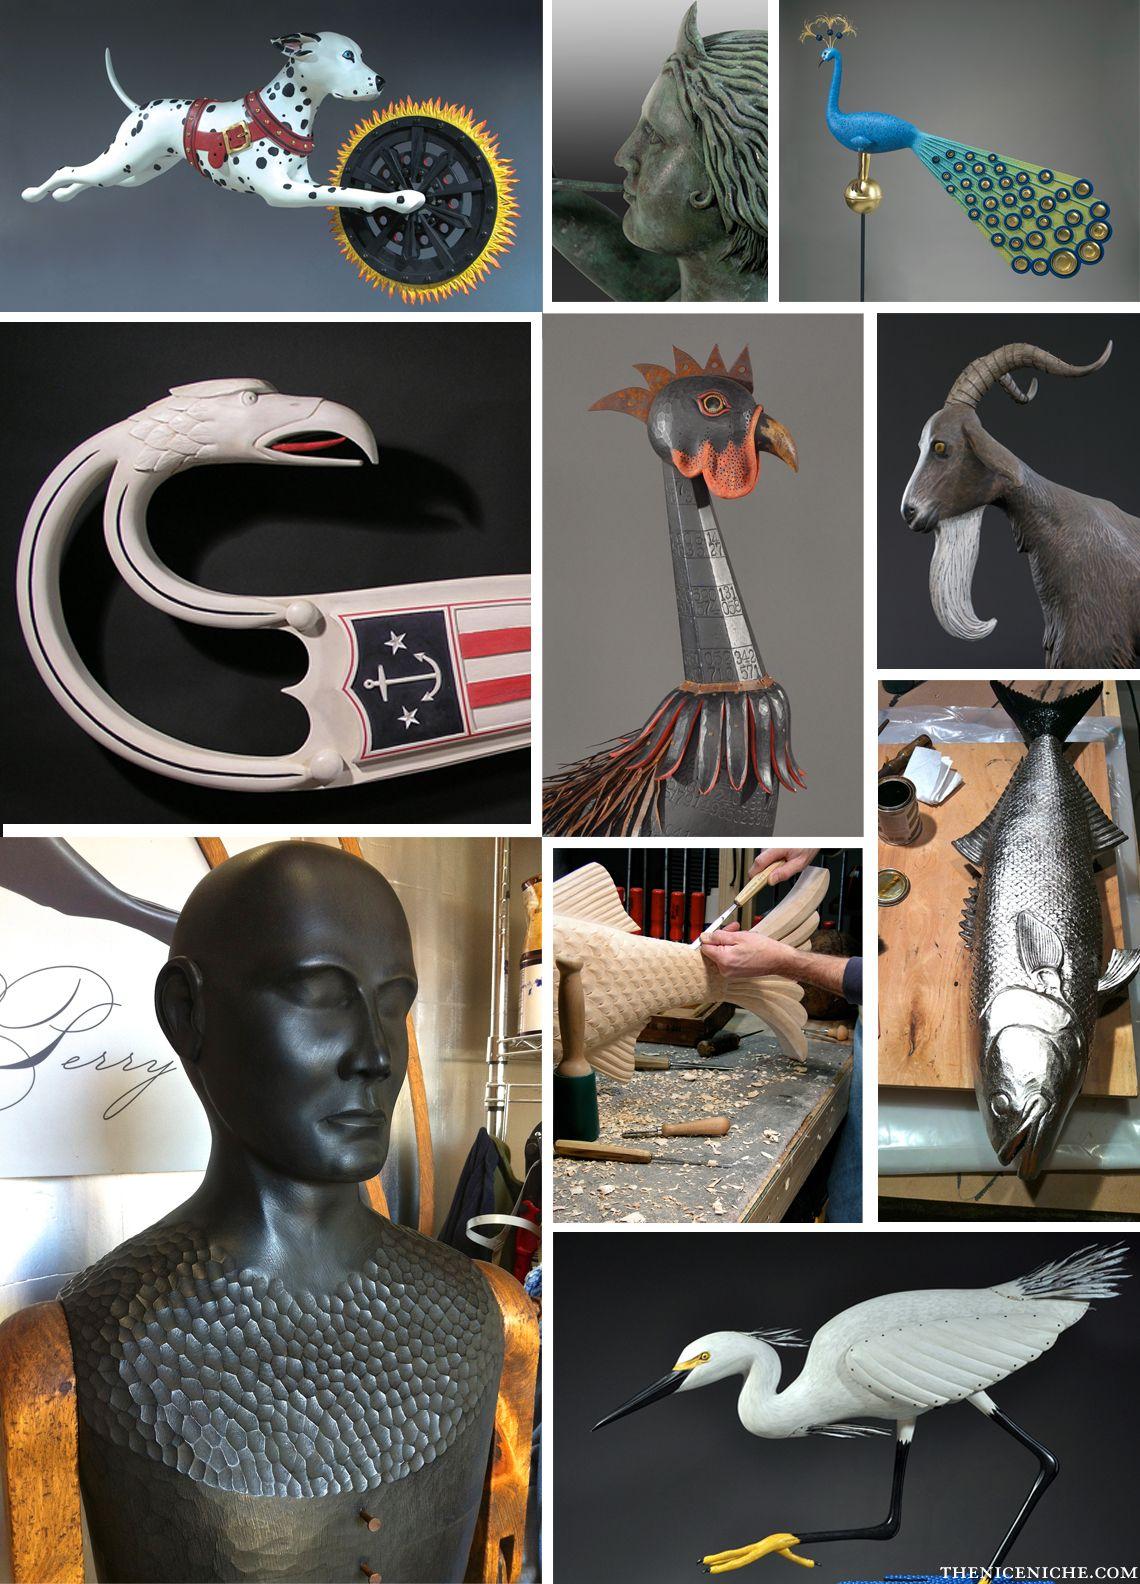 Mark A. Perry Nice Niche Feature, Redefining Folk Art - @Mark A. Perry Sculptor #folkart #americana #americanart #usa #sculpture